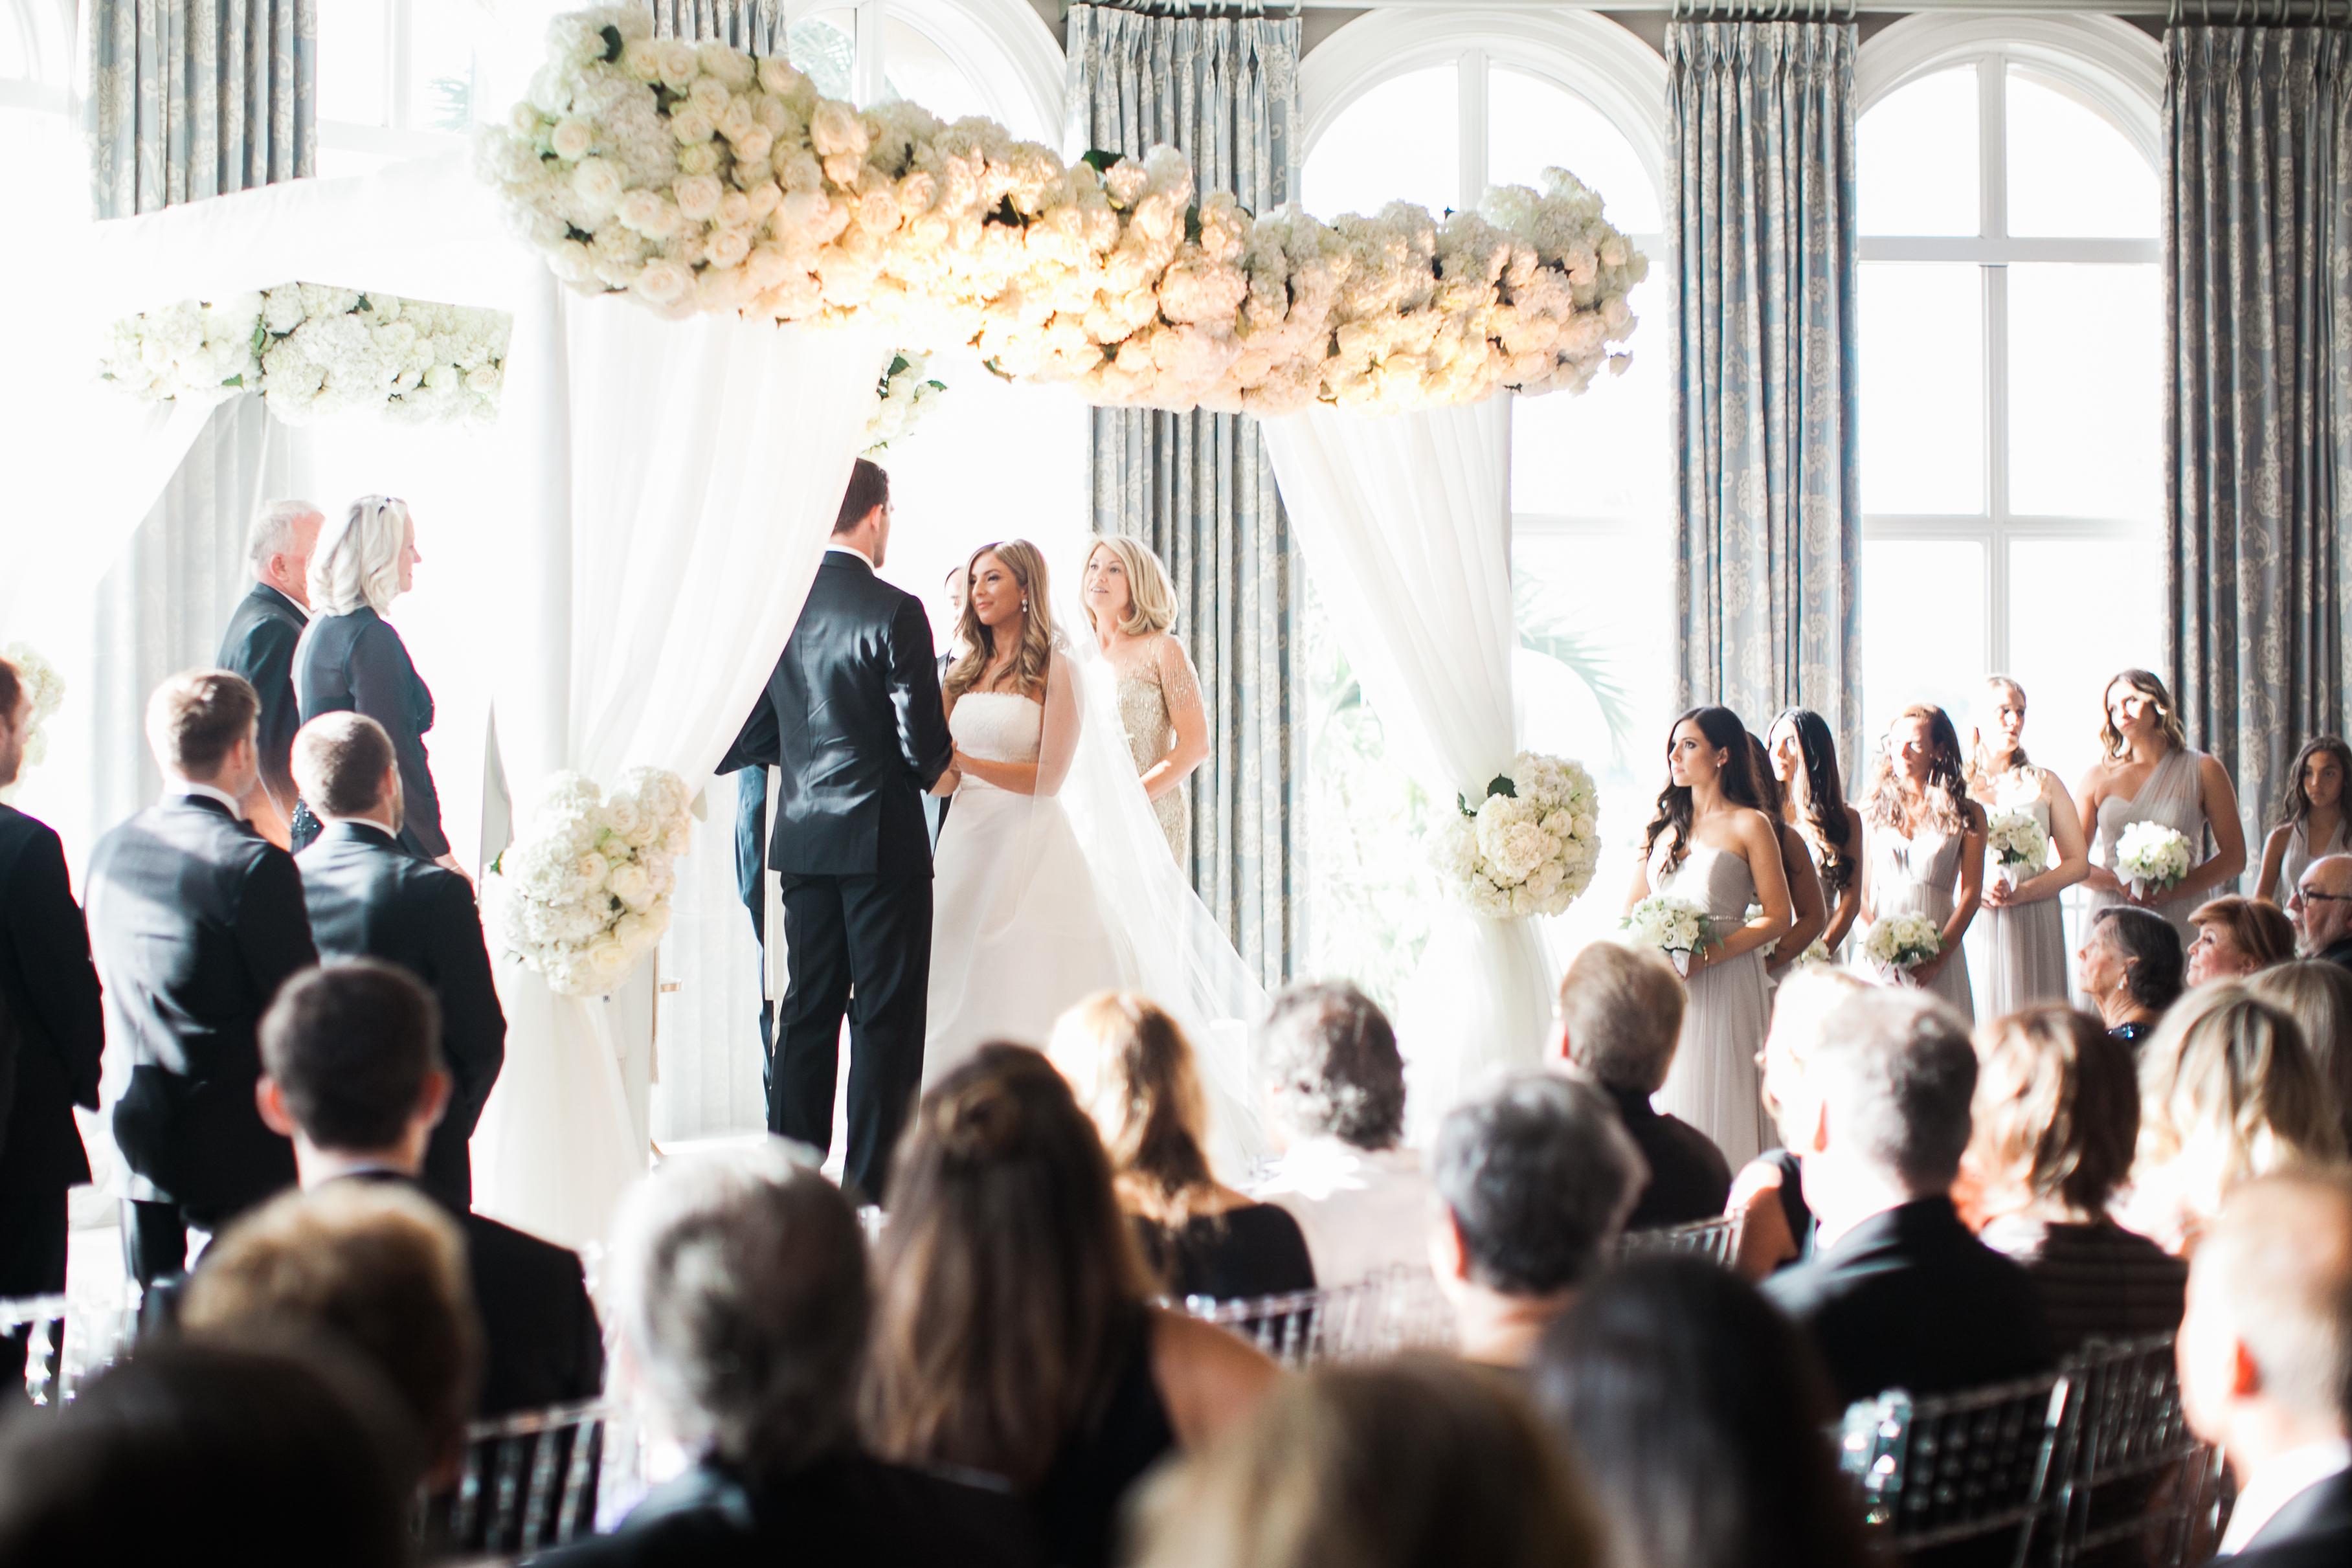 Stunning White & Silver Country Club Wedding - Posh Parties